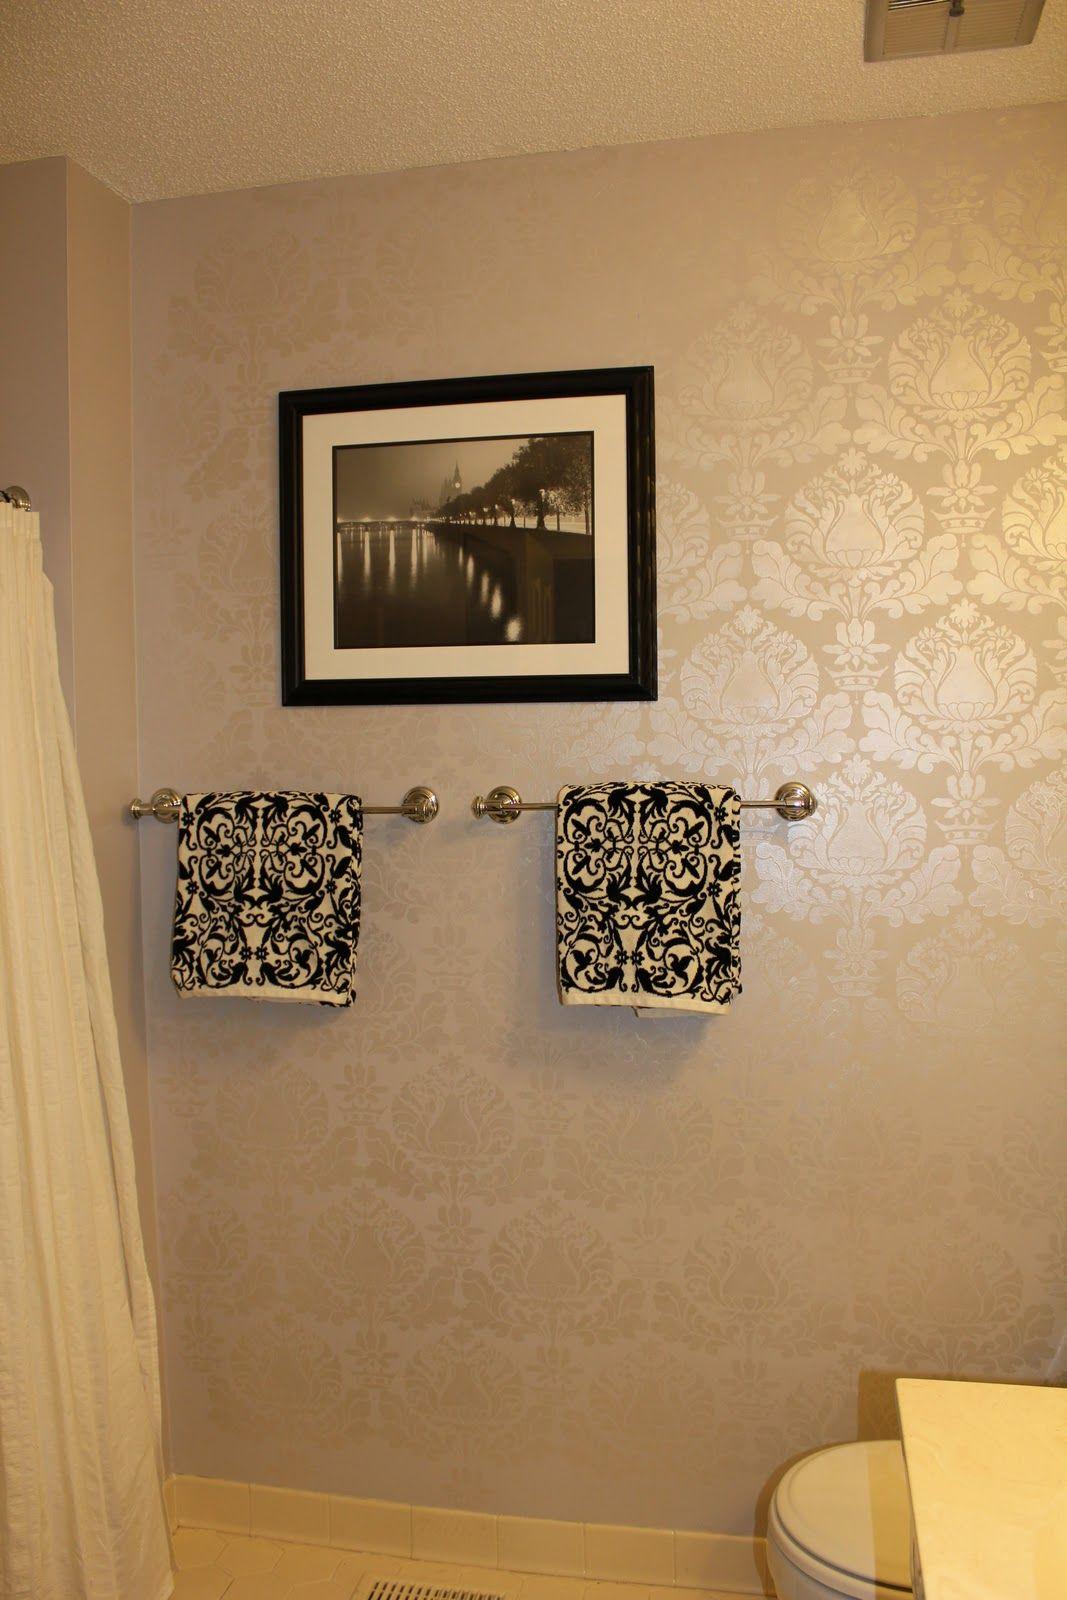 Wall Stencils For Painting Bathroom. Peahen Pad Guest Bathroom Wall Stencil